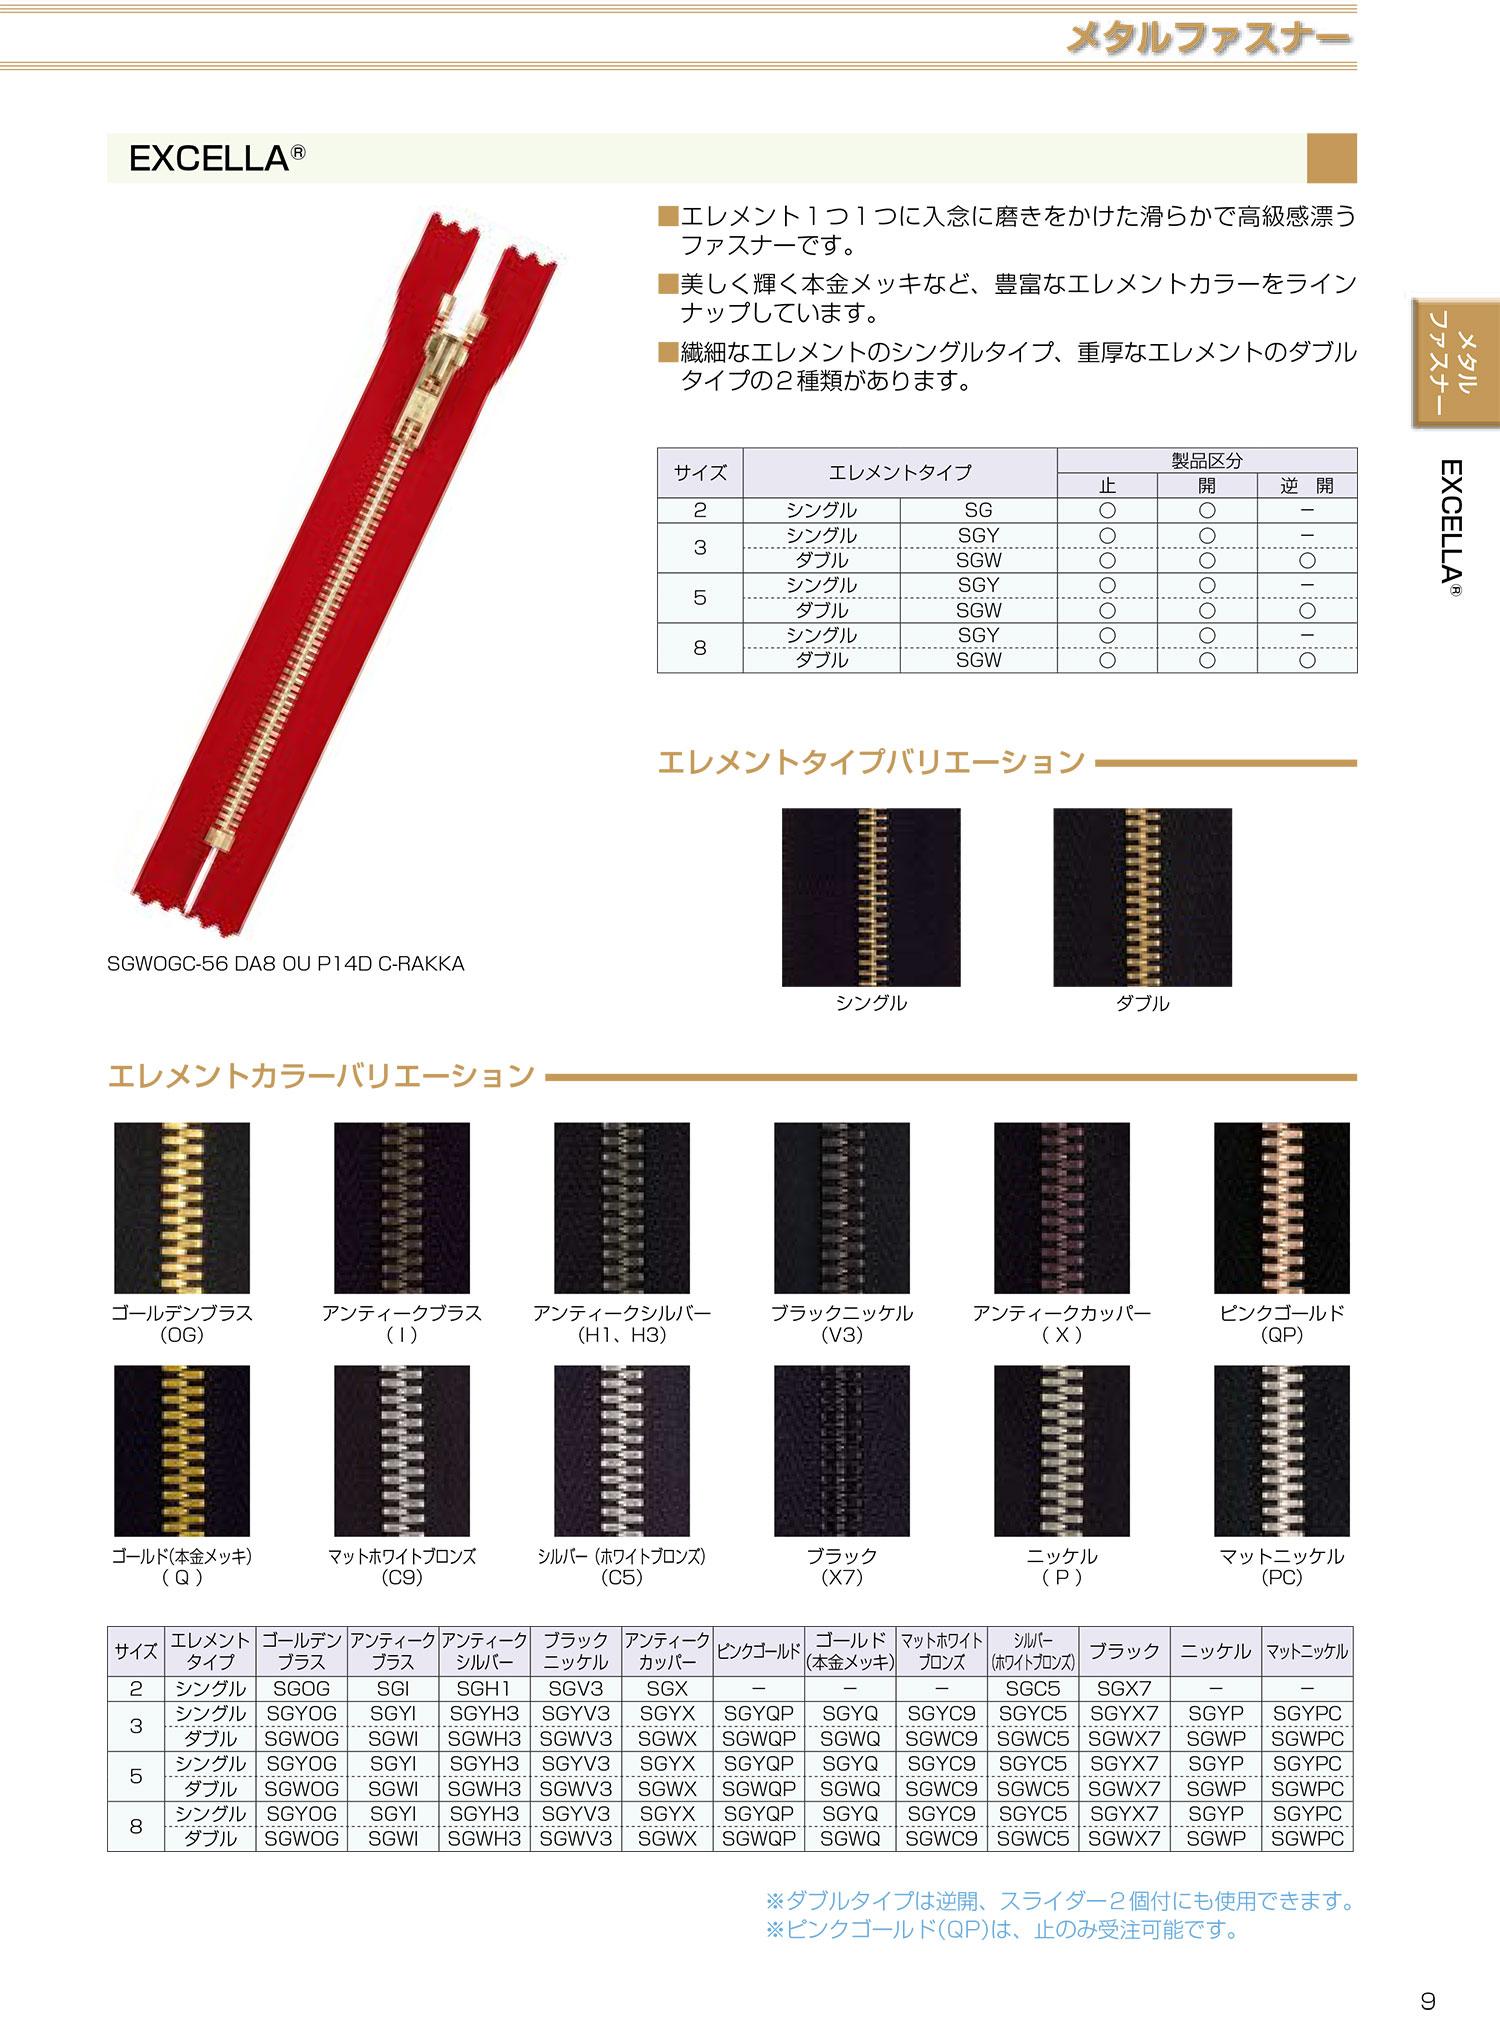 3SGWQMR エクセラ 3サイズ ゴールド(本金) 逆開 ダブル[ファスナー] YKK/オークラ商事 - ApparelX アパレル資材卸通販